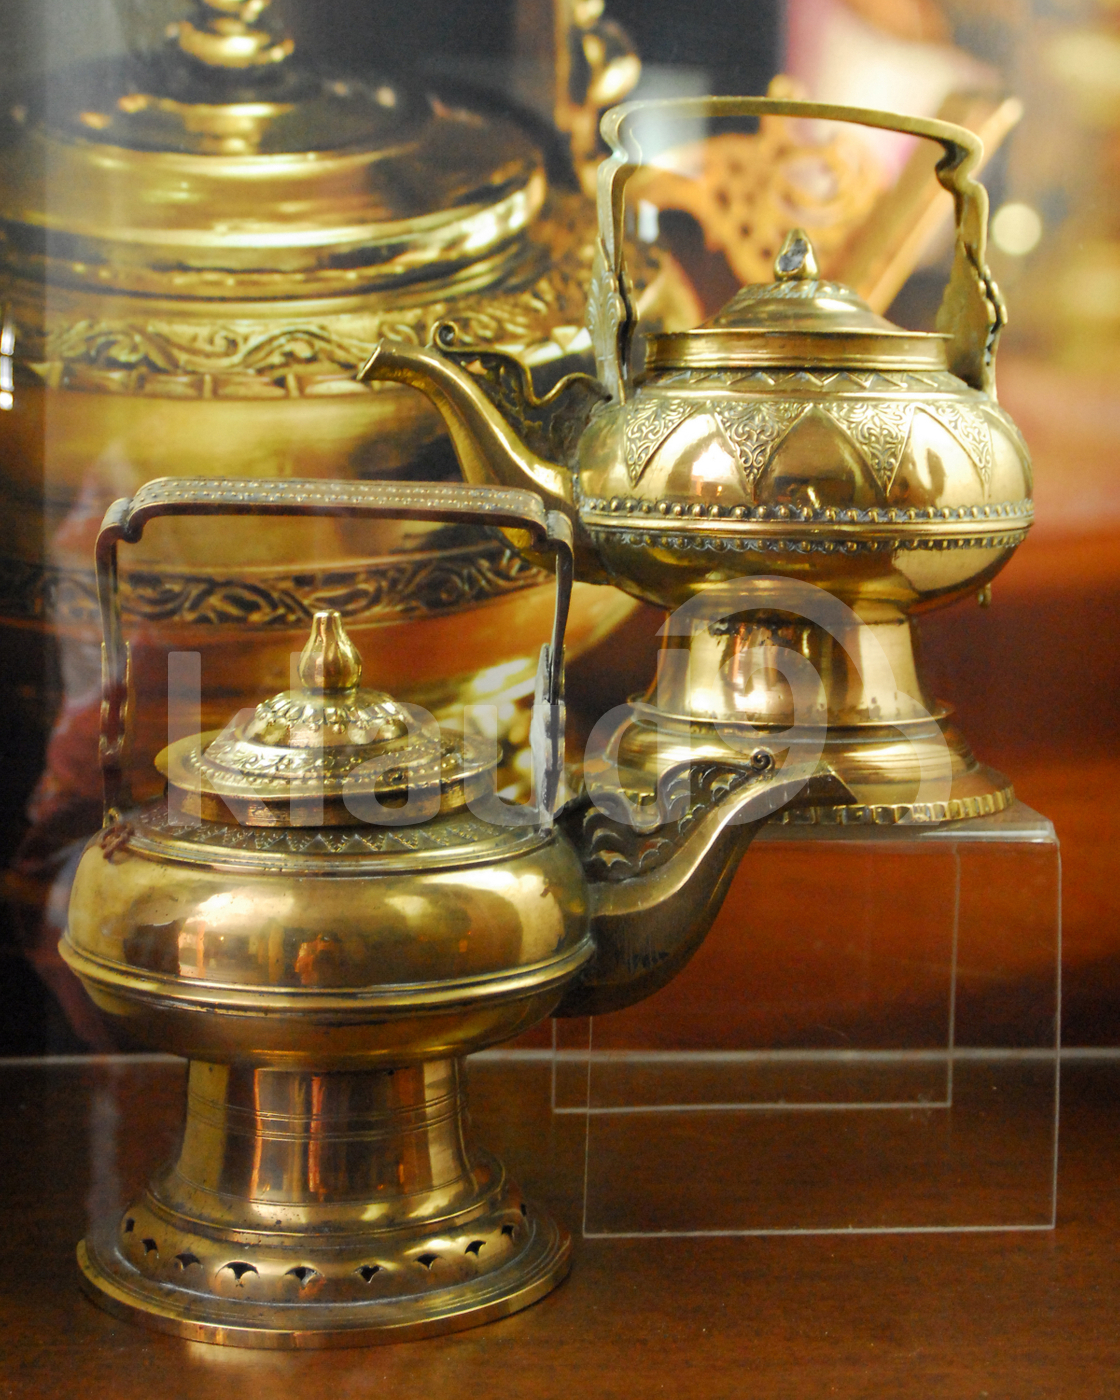 Keetle made of brassware